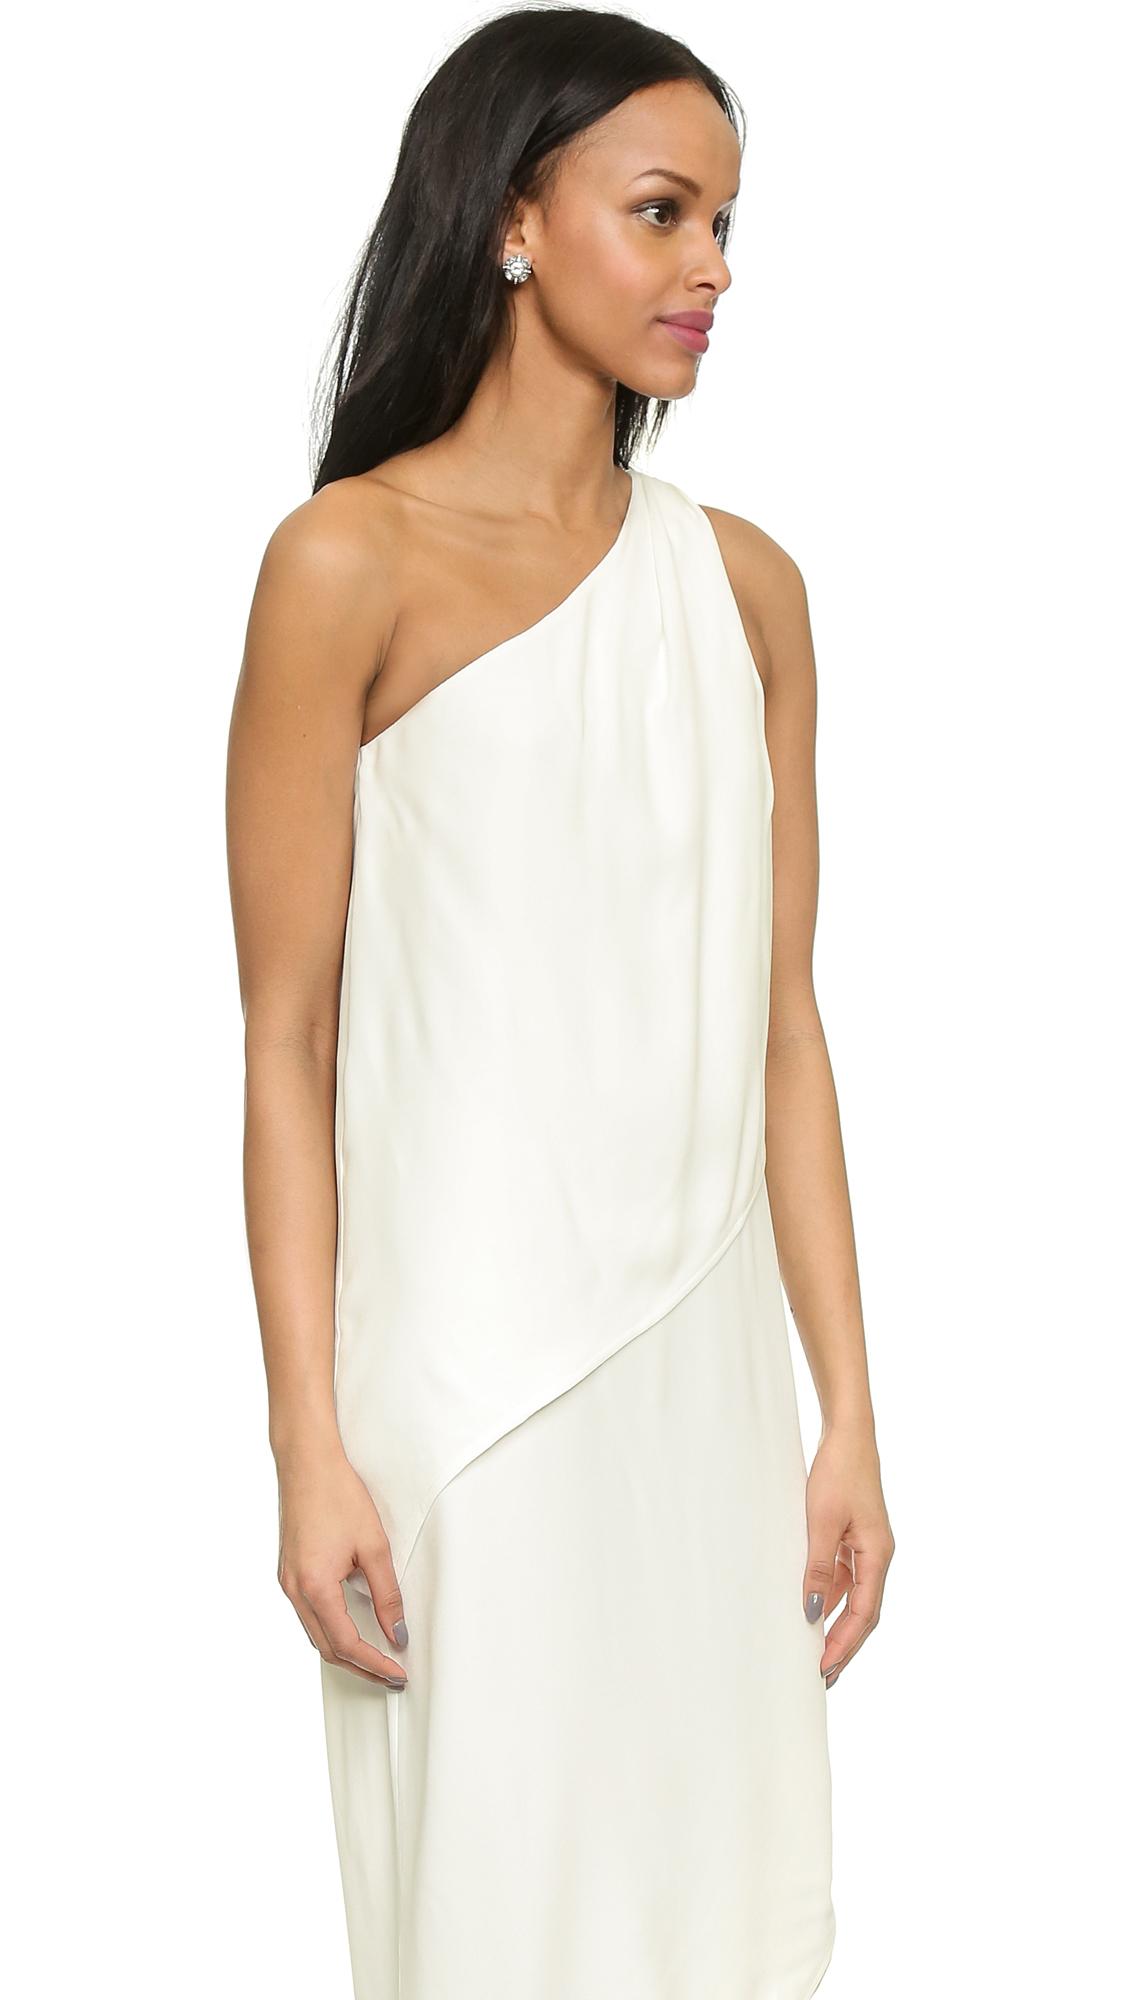 Bec &amp bridge Artemis One Shoulder Dress - White in White  Lyst